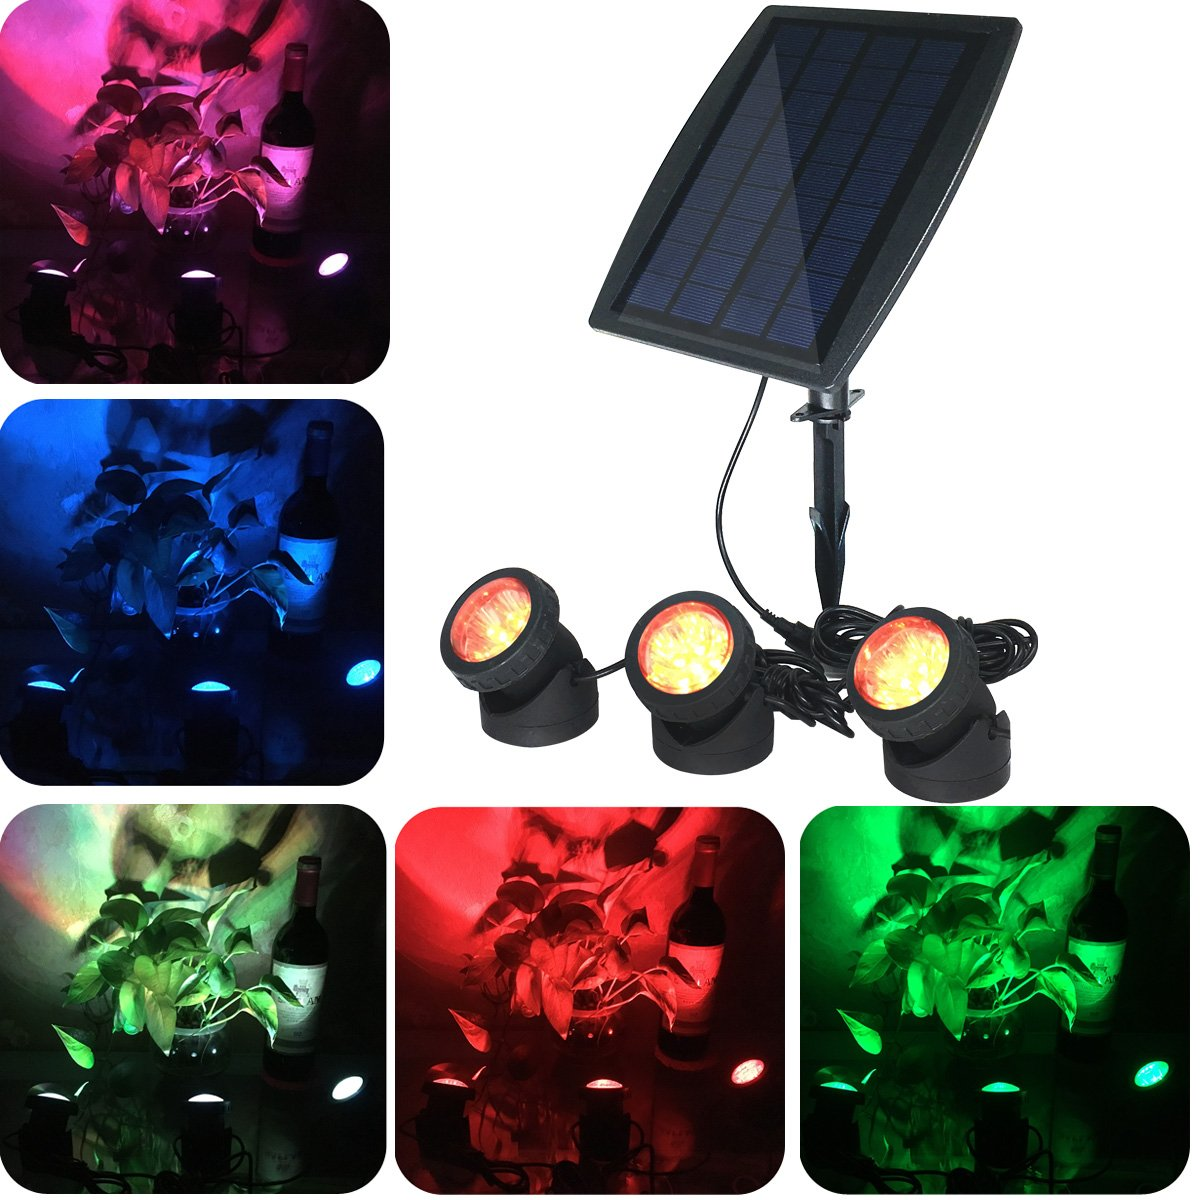 Solarstrahler LED 3 Lampe Wegleuchte Garten Beleuchtung Landschaft     3